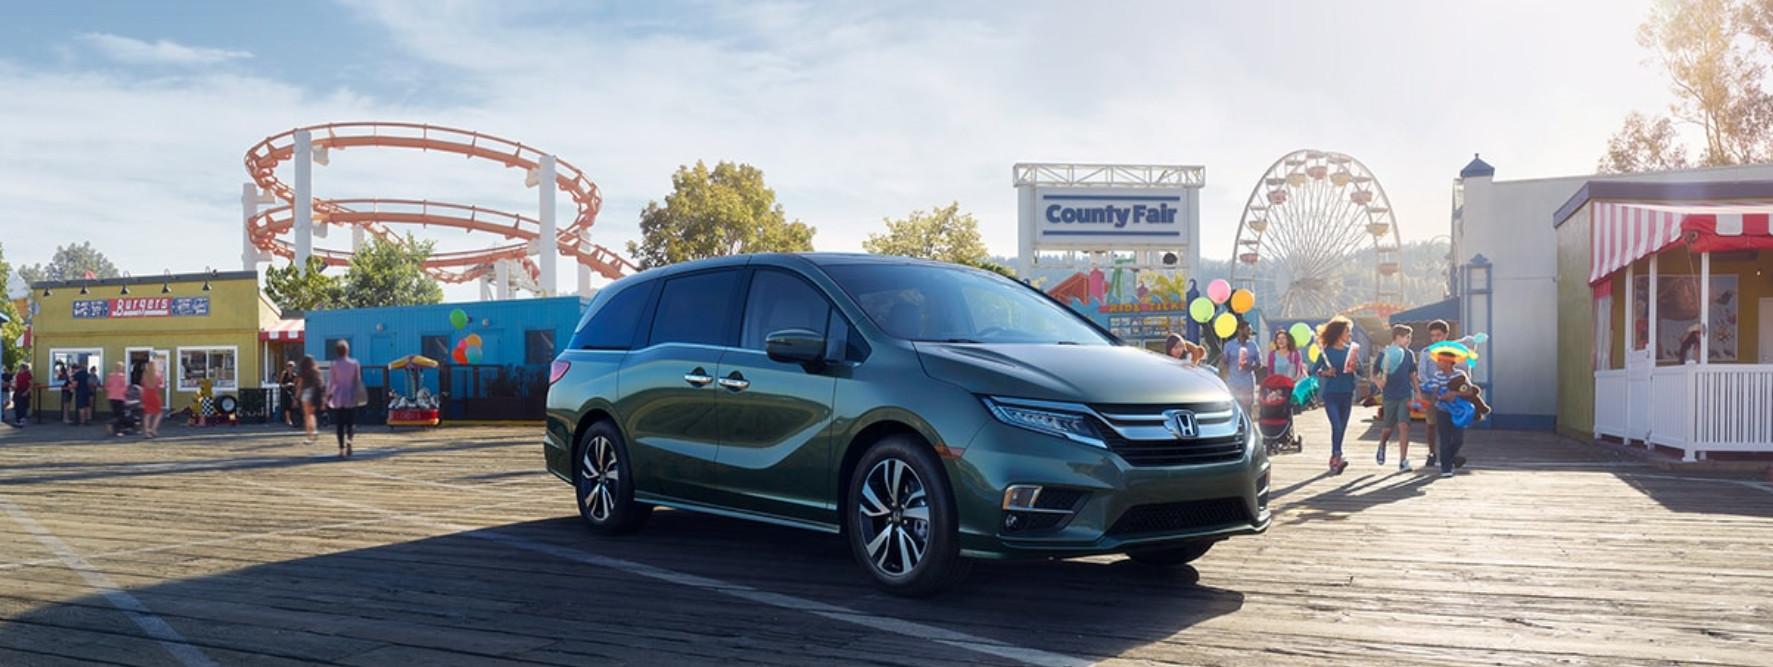 2020 Honda Odyssey for Sale near Sleepy Hollow, IL